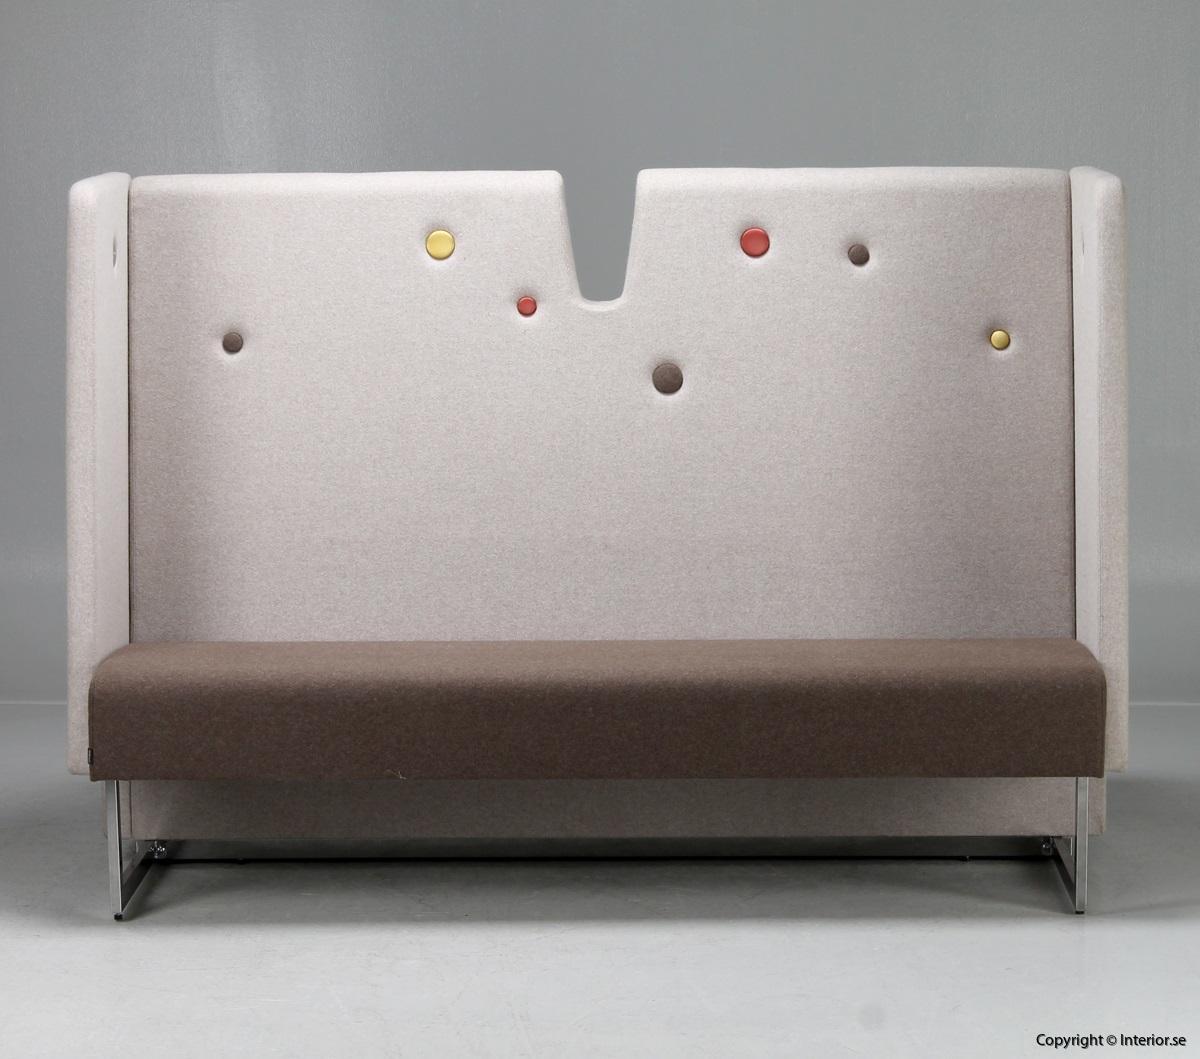 1 Materia Le Mur Wivian Eidsaunet &Marie Oscarsson (2)